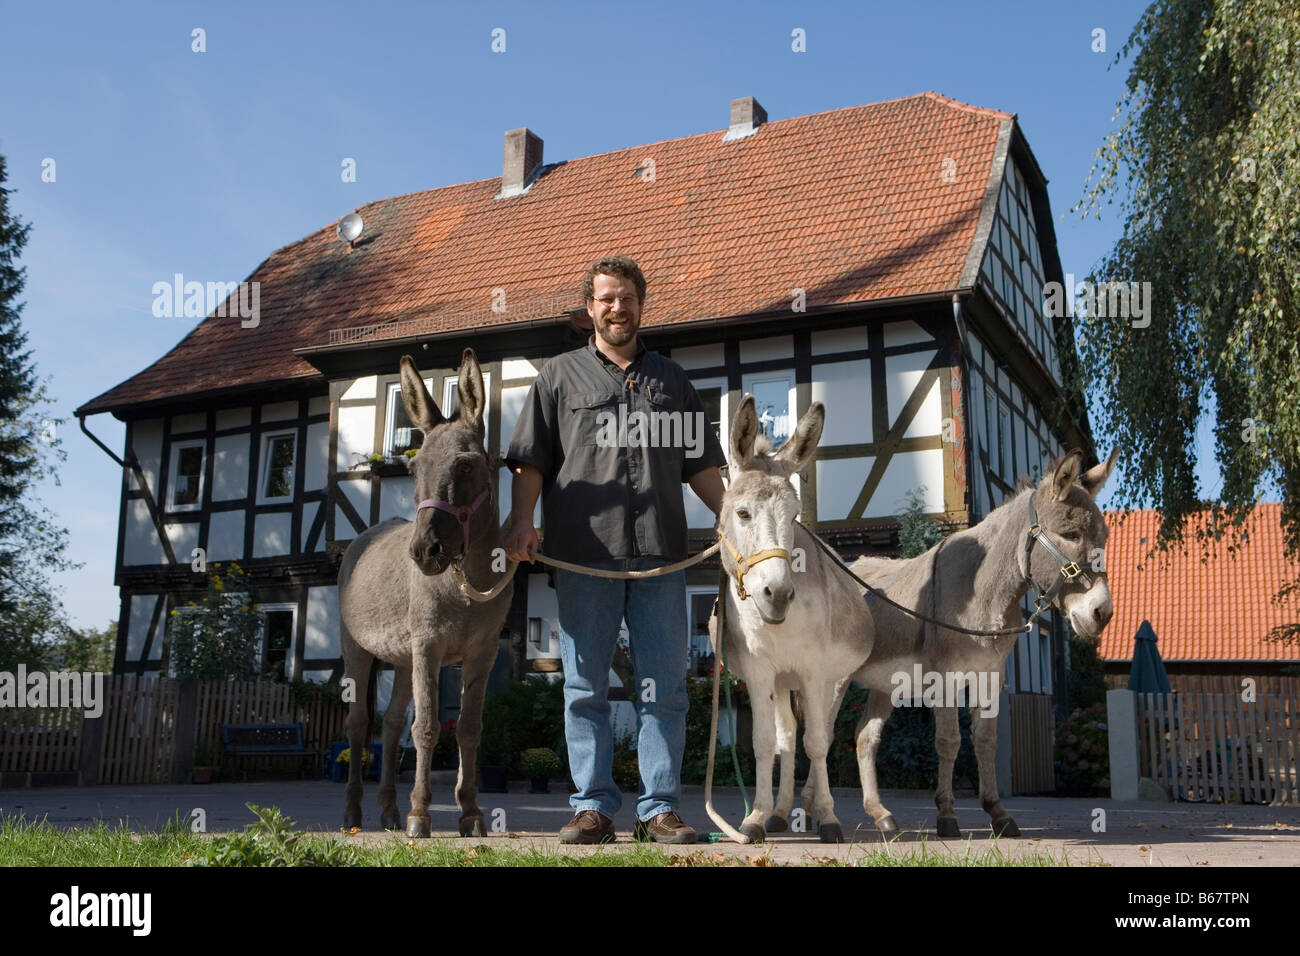 Man with three pet donkeys, Haunetal Neukirchen, Rhoen, Hesse, Germany - Stock Image